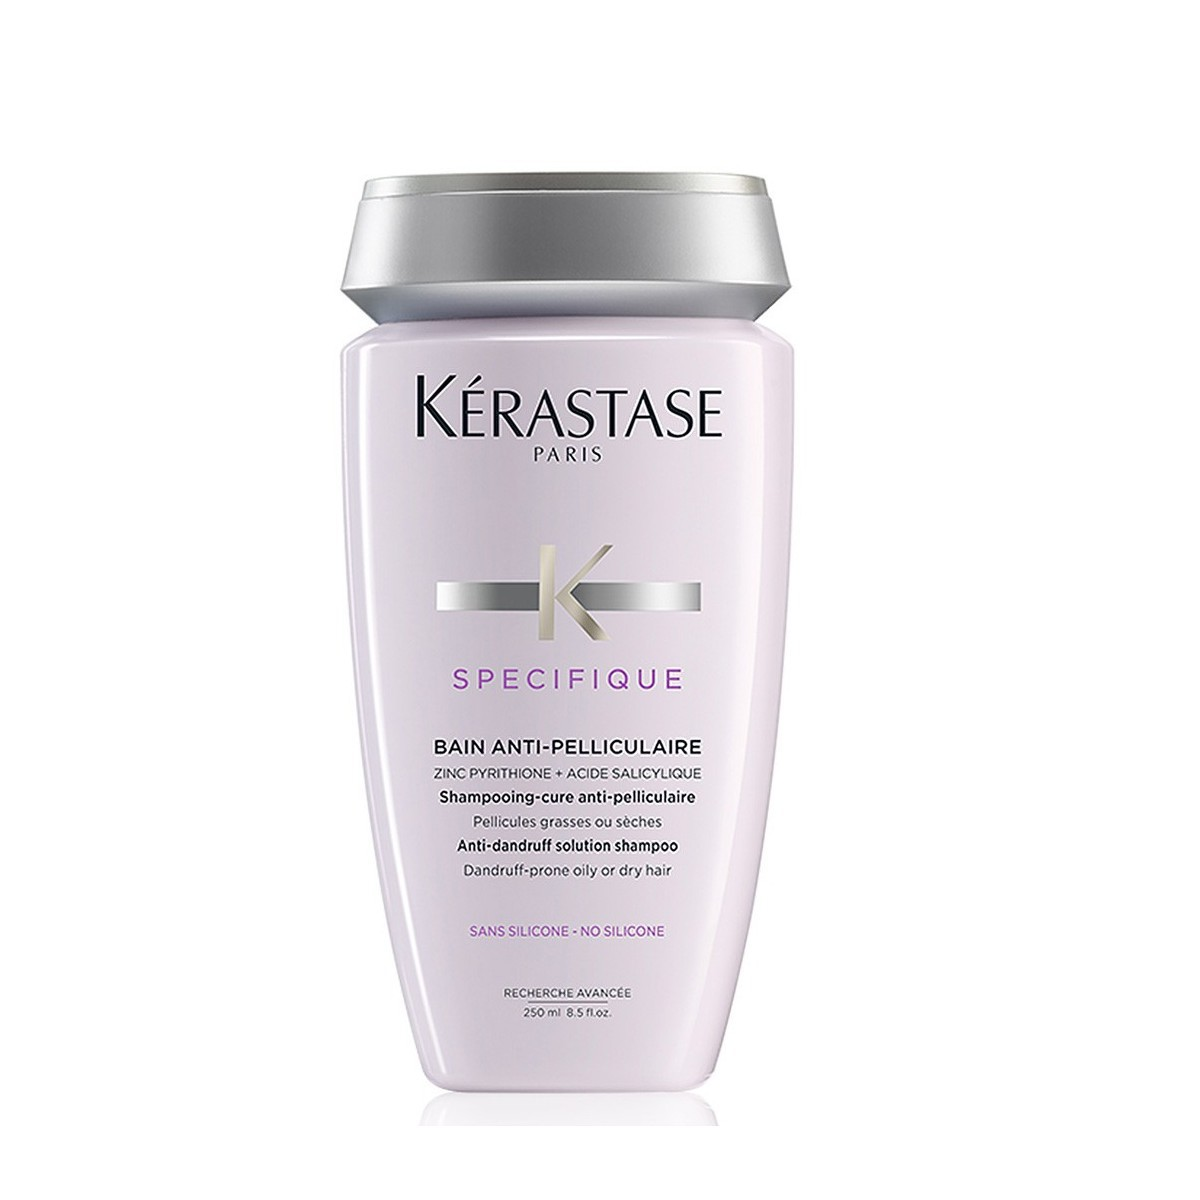 Kérastase Spécifique Bain Anti-Pelicullaire - Shampoo 250ml - CA